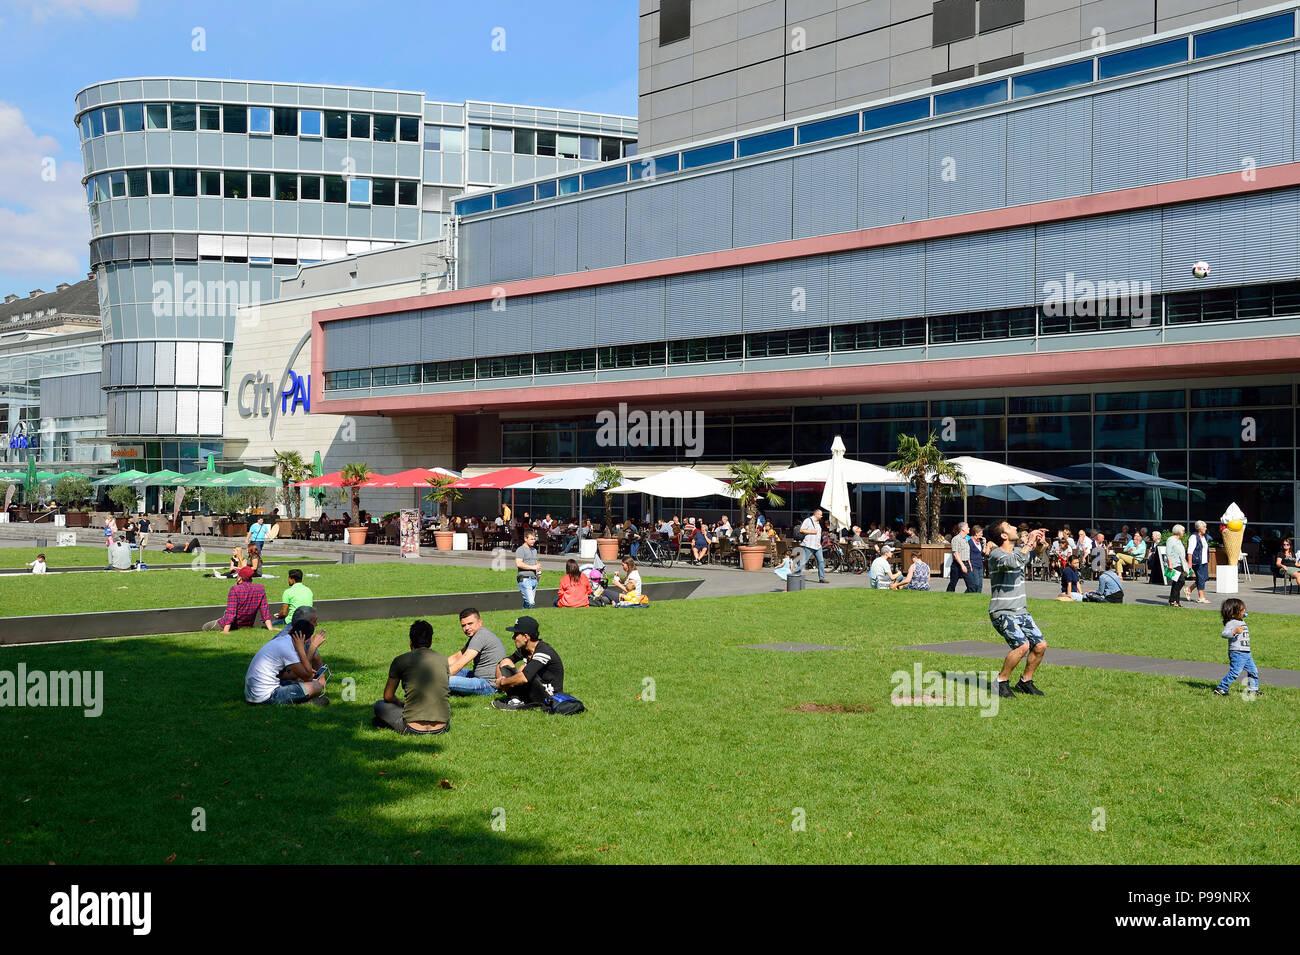 Germany, North Rhine-Westphalia downtown Duisburg - Stock Image